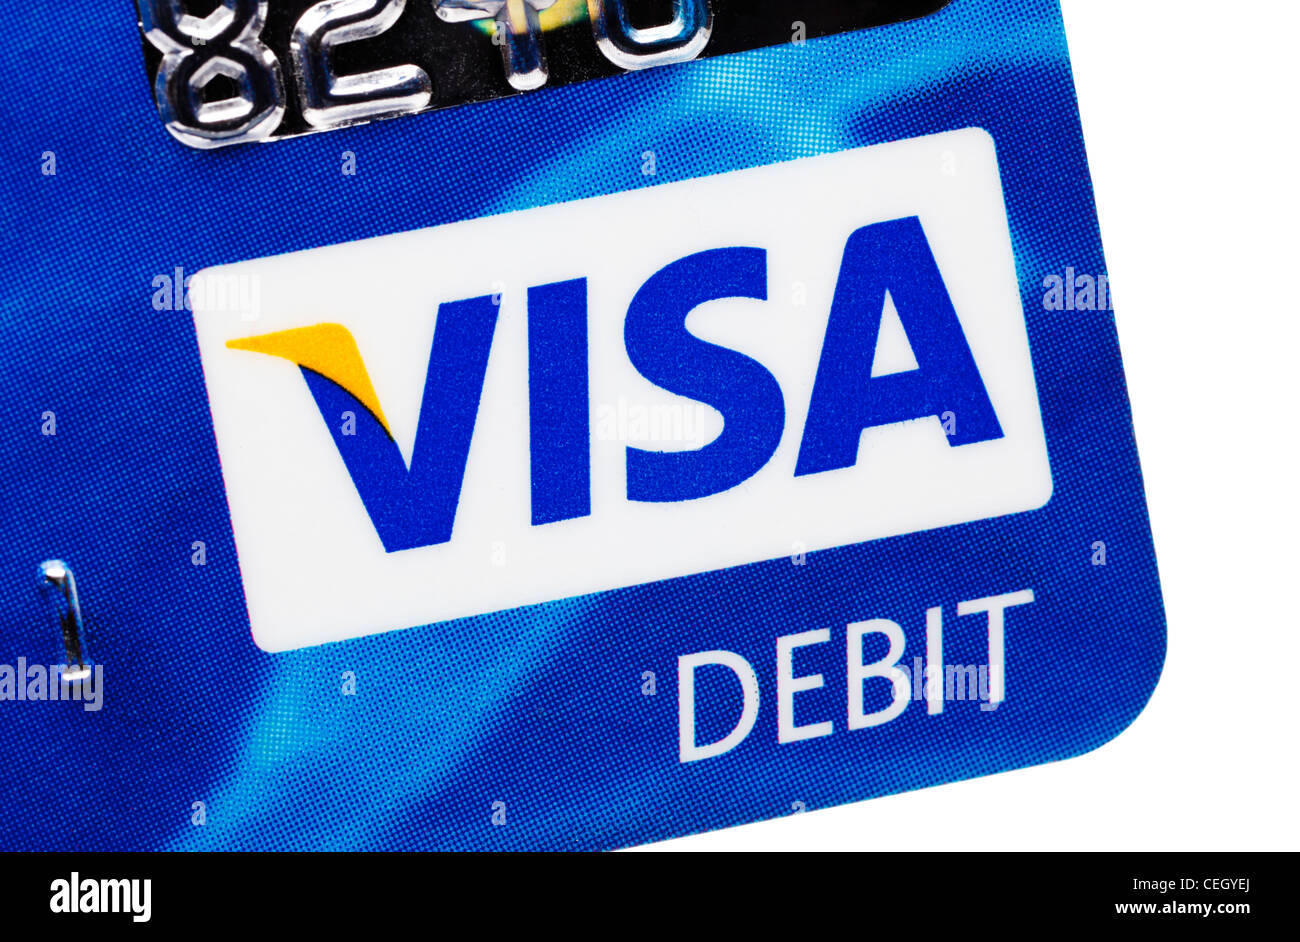 Visa debit card logo Nahaufnahme Stockfotografie - Alamy